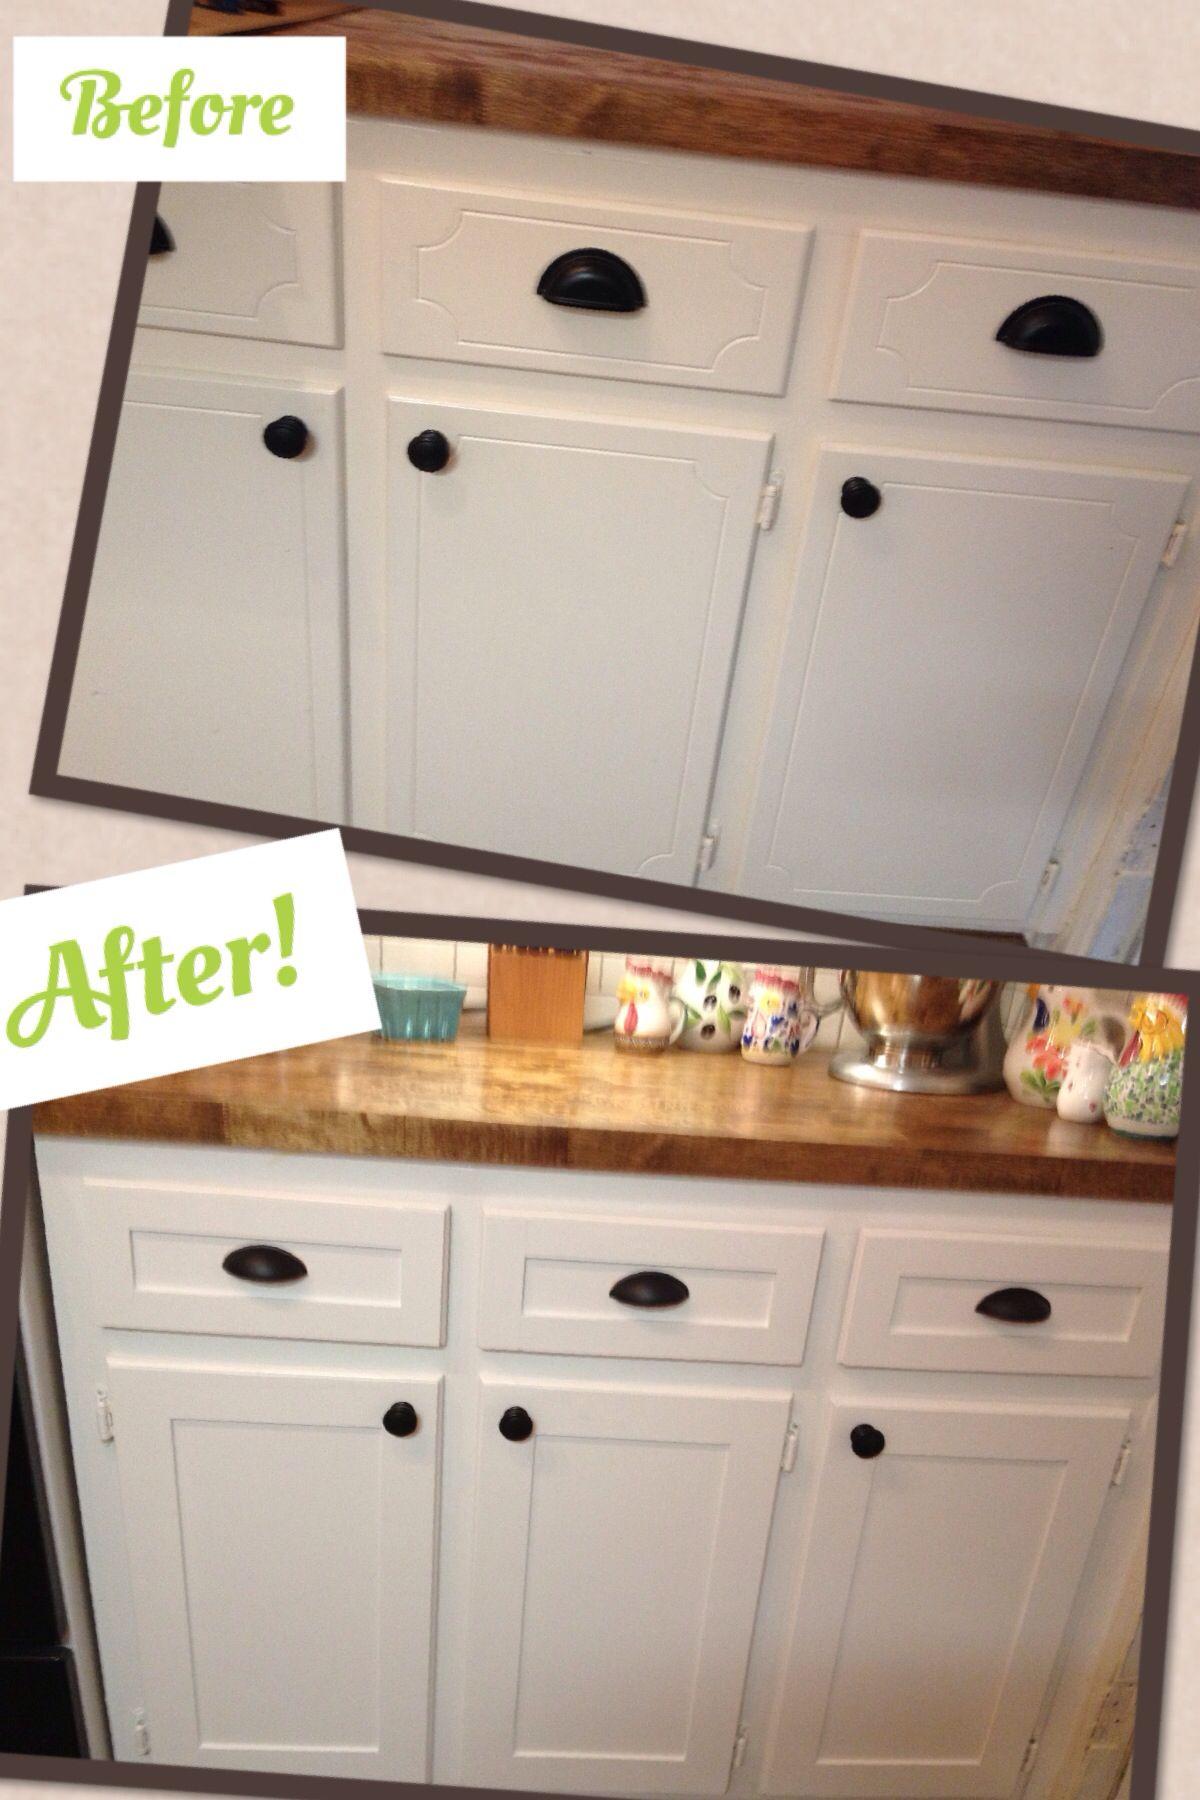 diy kitchen cabinet refacing long islands project shaker trim done